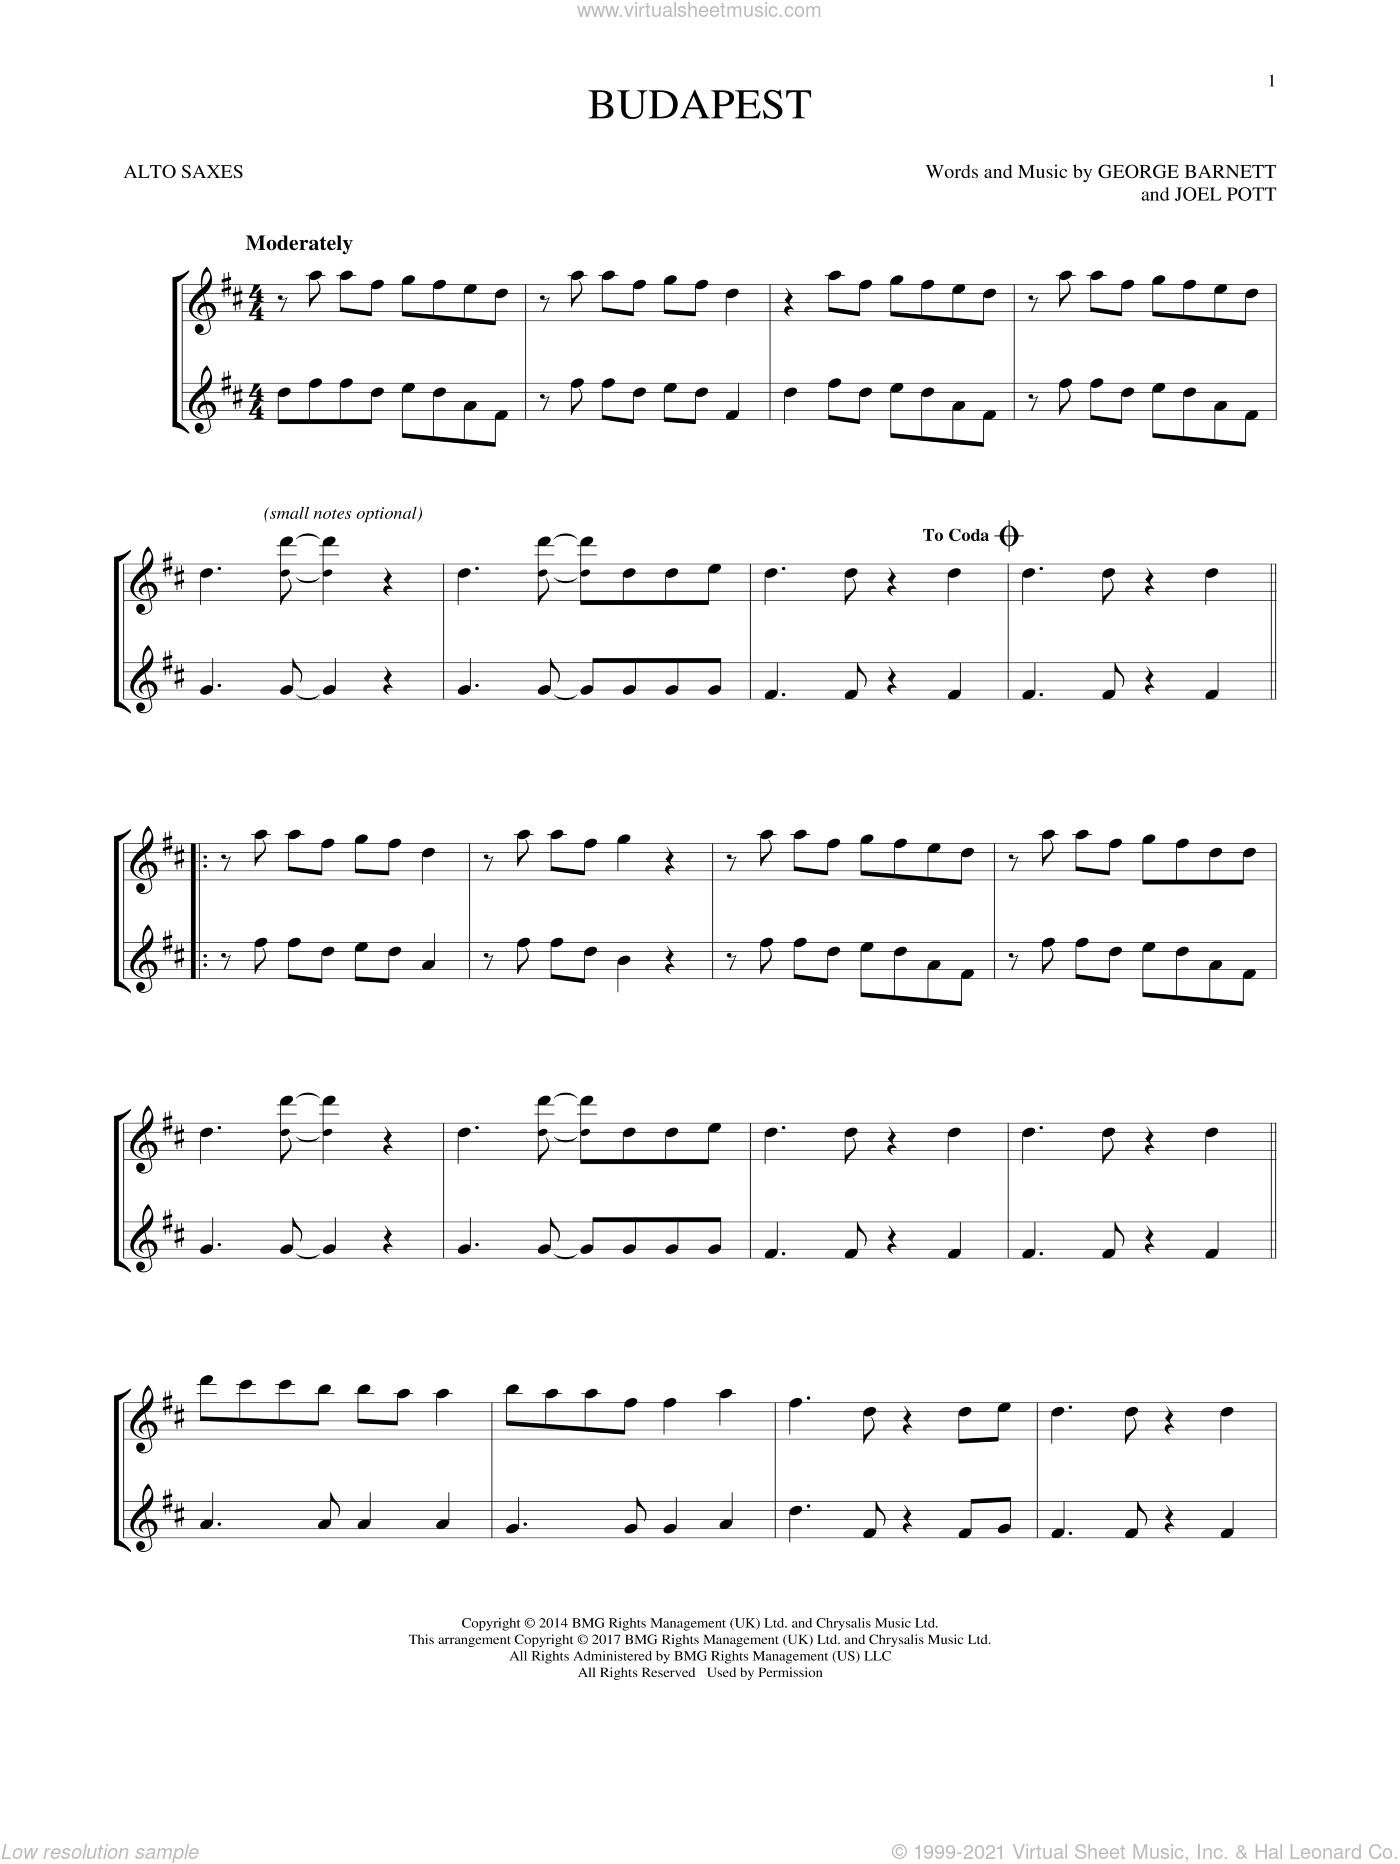 Budapest sheet music for two alto saxophones (duets) by George Ezra, George Barnett and Joel Pott, intermediate skill level